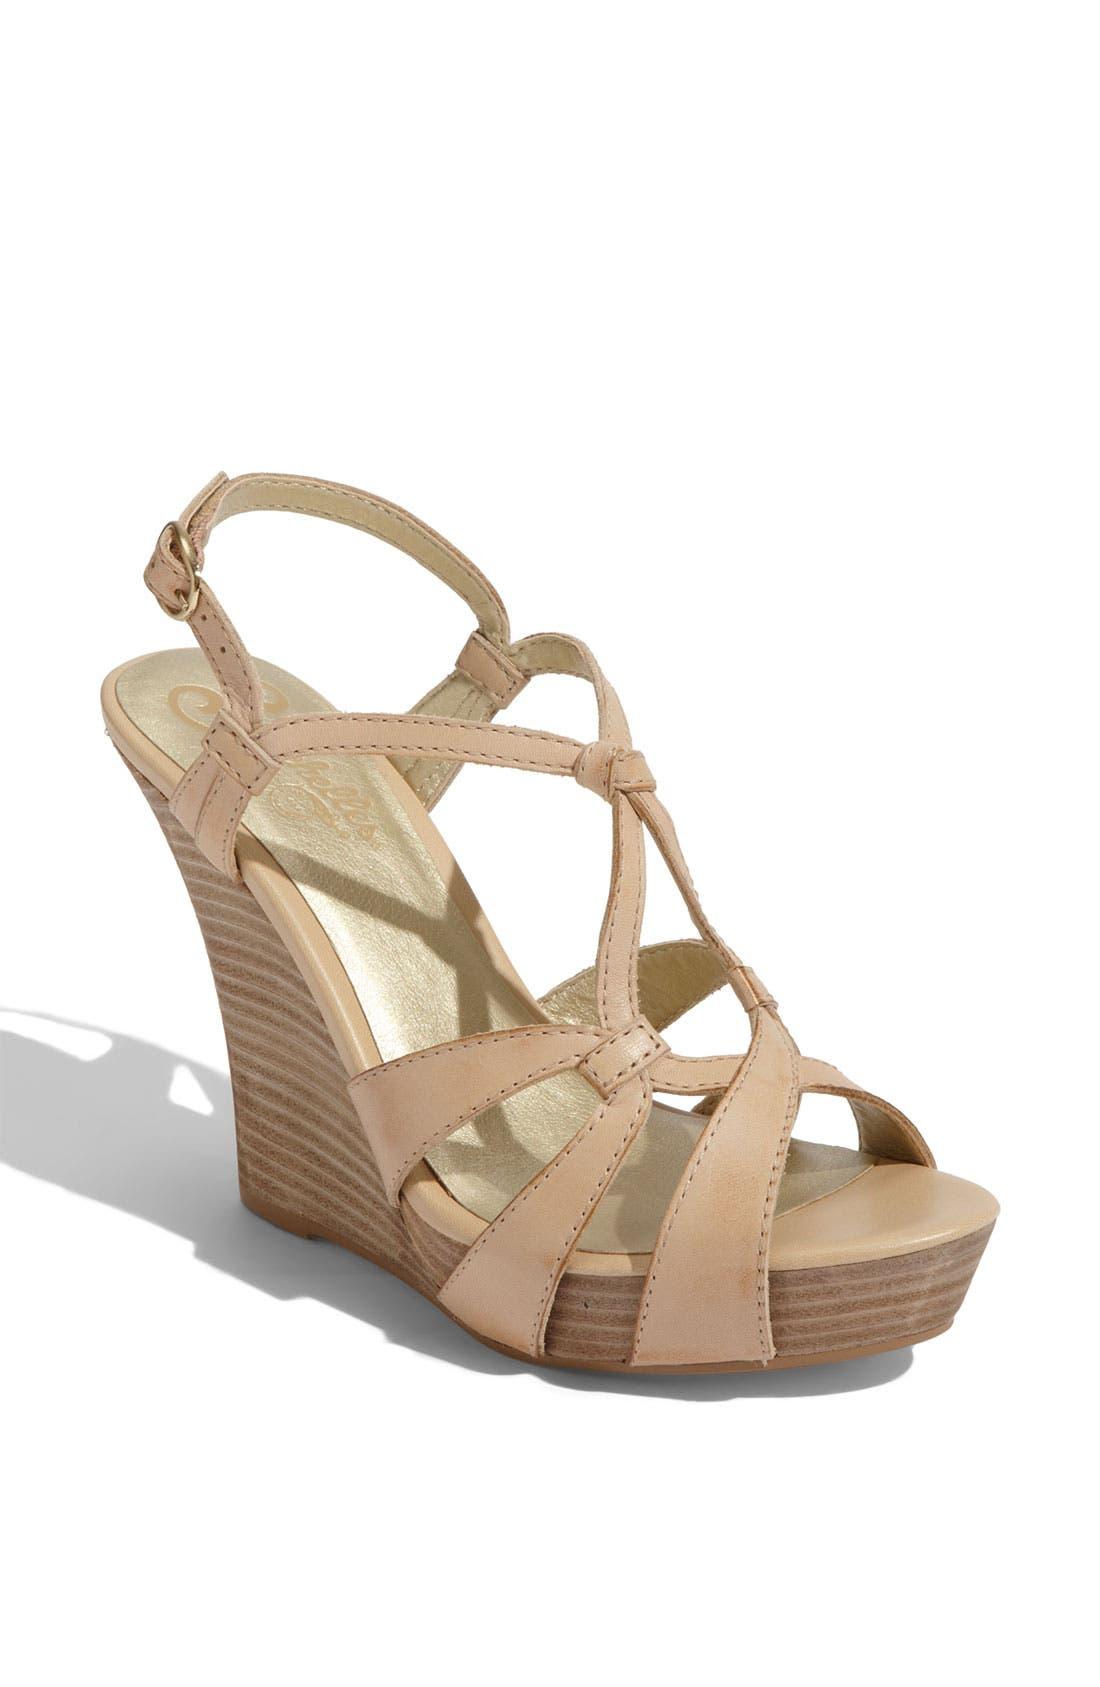 Alternate Image 1 Selected - Seychelles 'Purr' Wedge Sandal